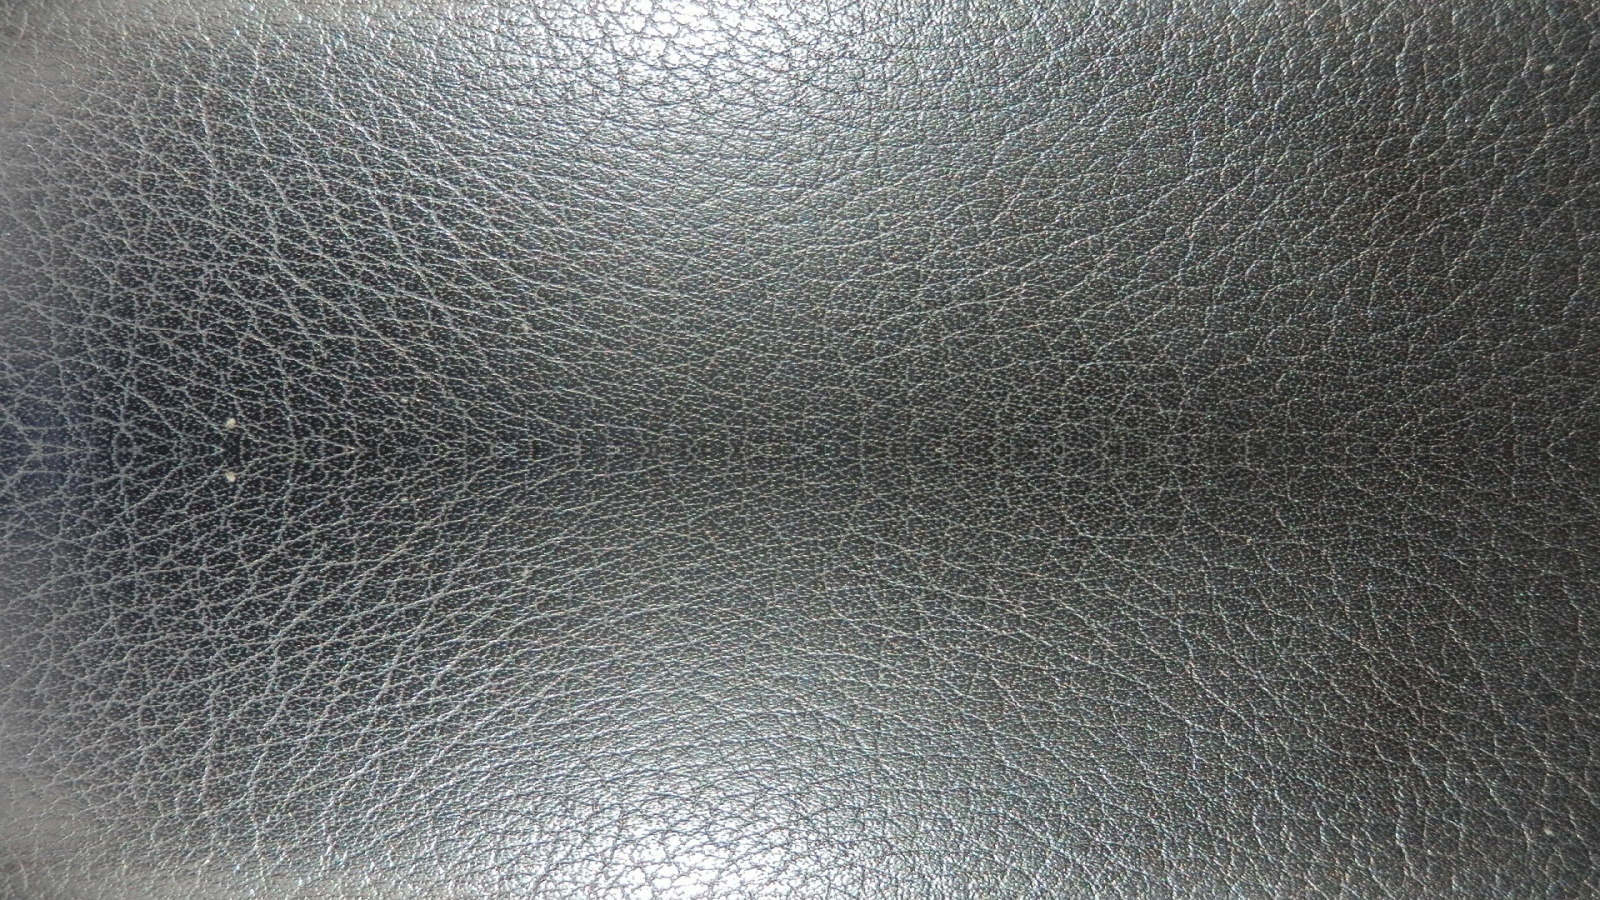 Download Wallpaper 1600x900 skin texture light silver white 1600x900